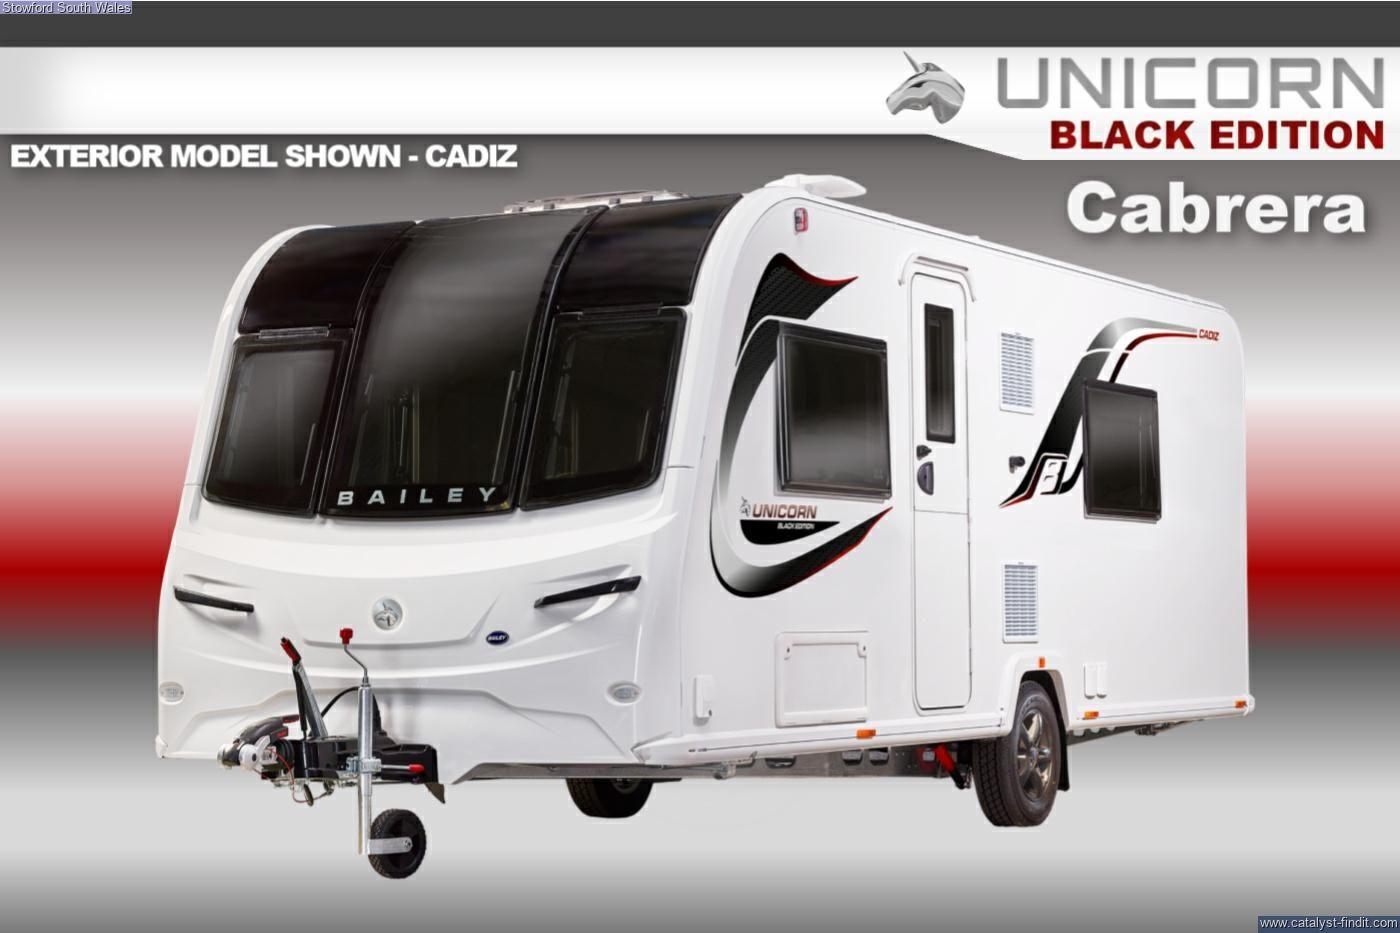 Bailey Unicorn Black Edition Cabrera 2021